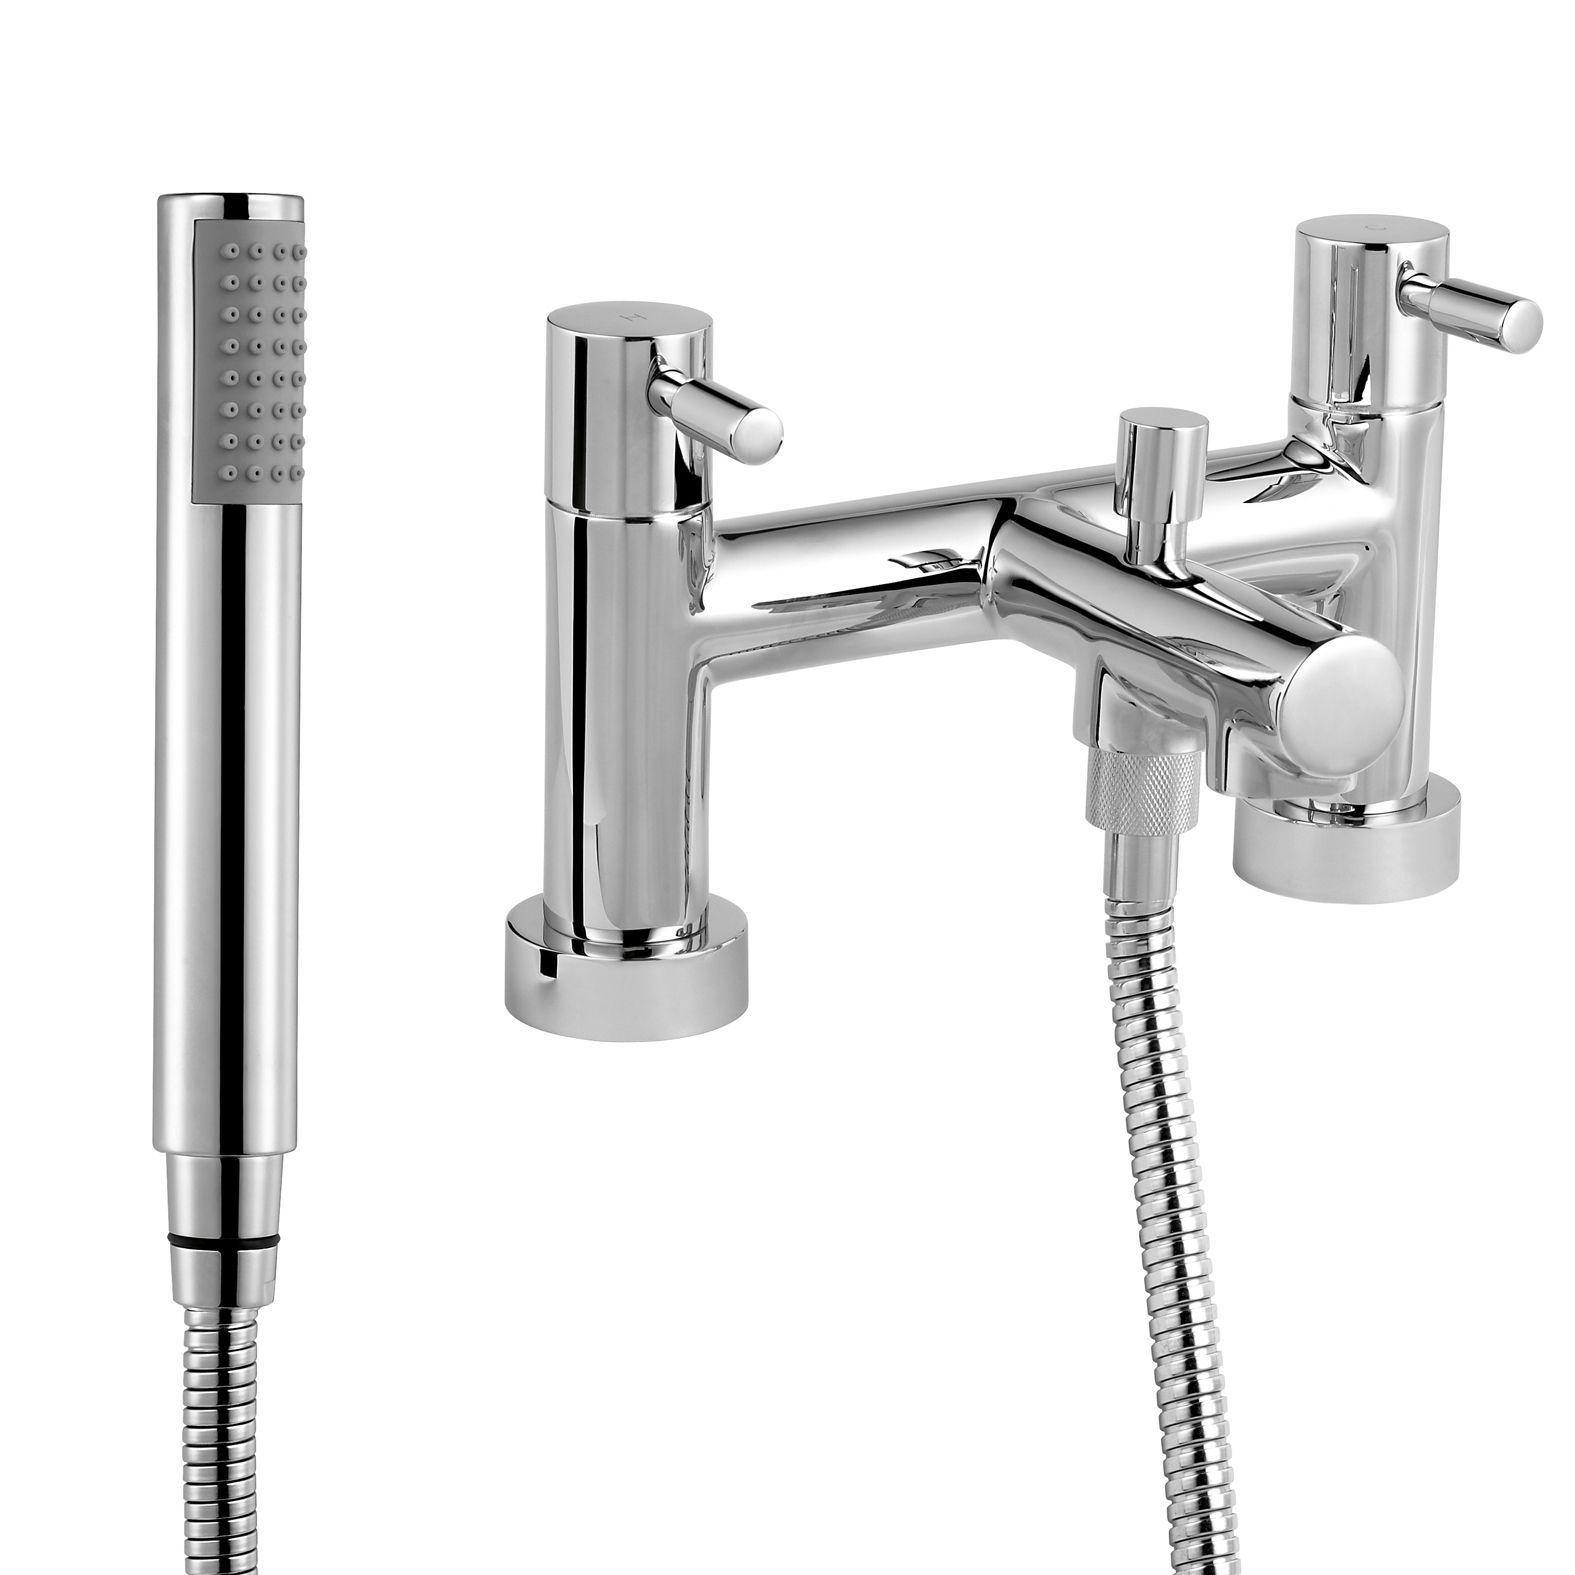 B&Q Cirque Chrome finish Bath shower mixer tap | Departments | DIY ...